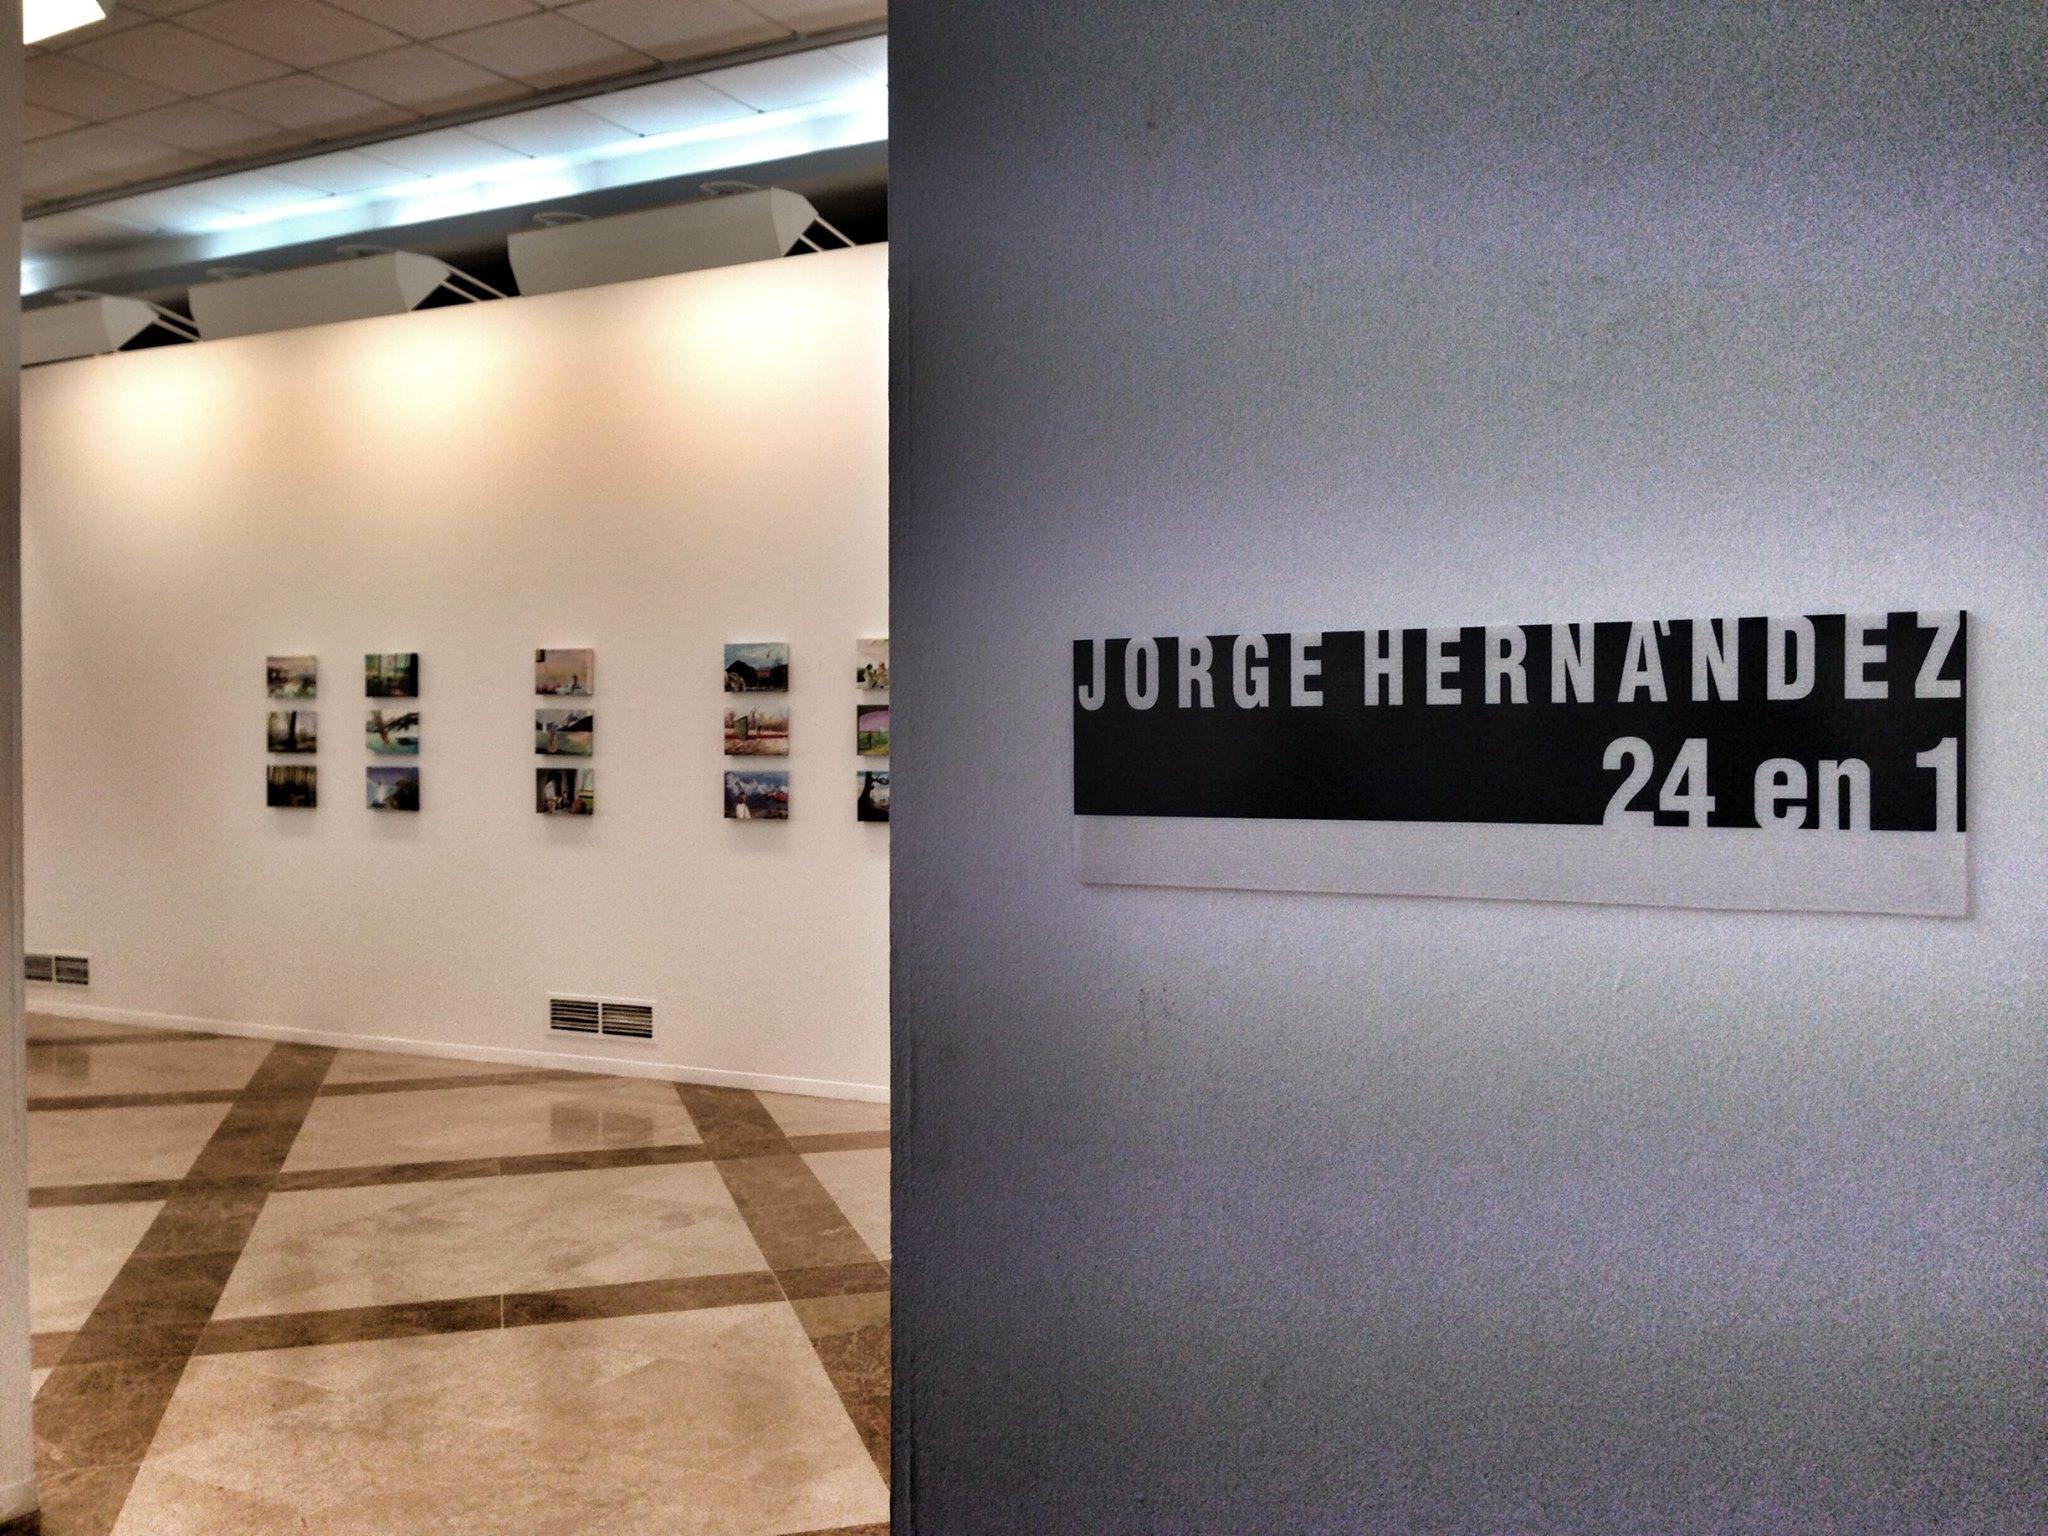 '24 en 1'. Festival de Cine Iberoamericano, Huelva 2013. Comisariada por Elena Caranca e Isabel Ignacio.